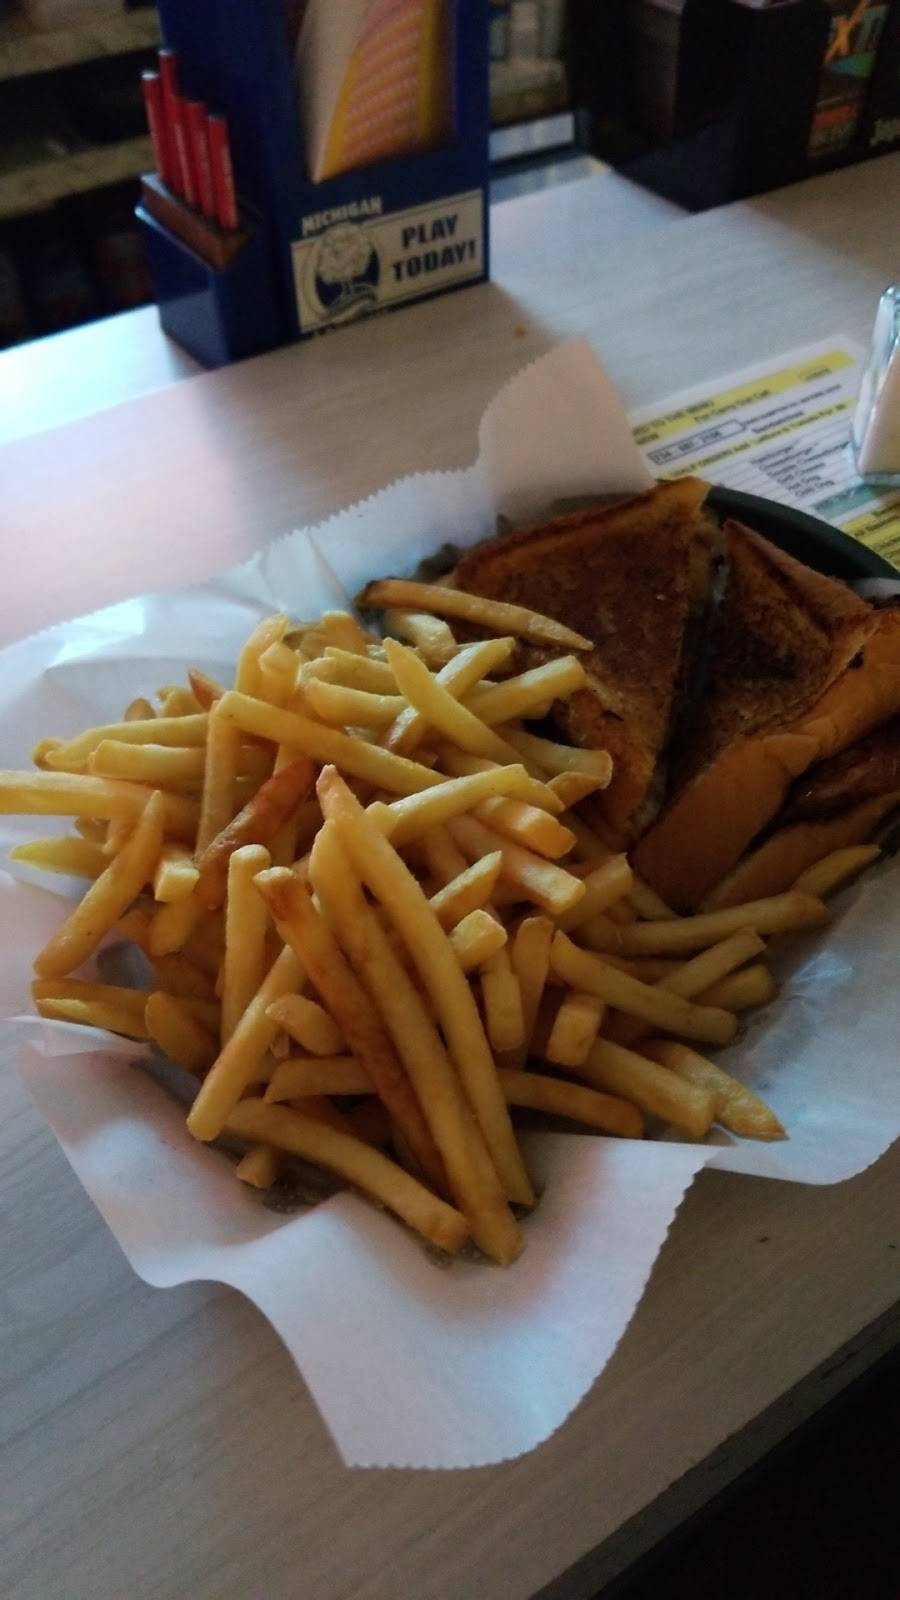 Silver Star Bar | restaurant | 10400 Sumpter Rd, Maybee, MI 48159, USA | 7345873156 OR +1 734-587-3156